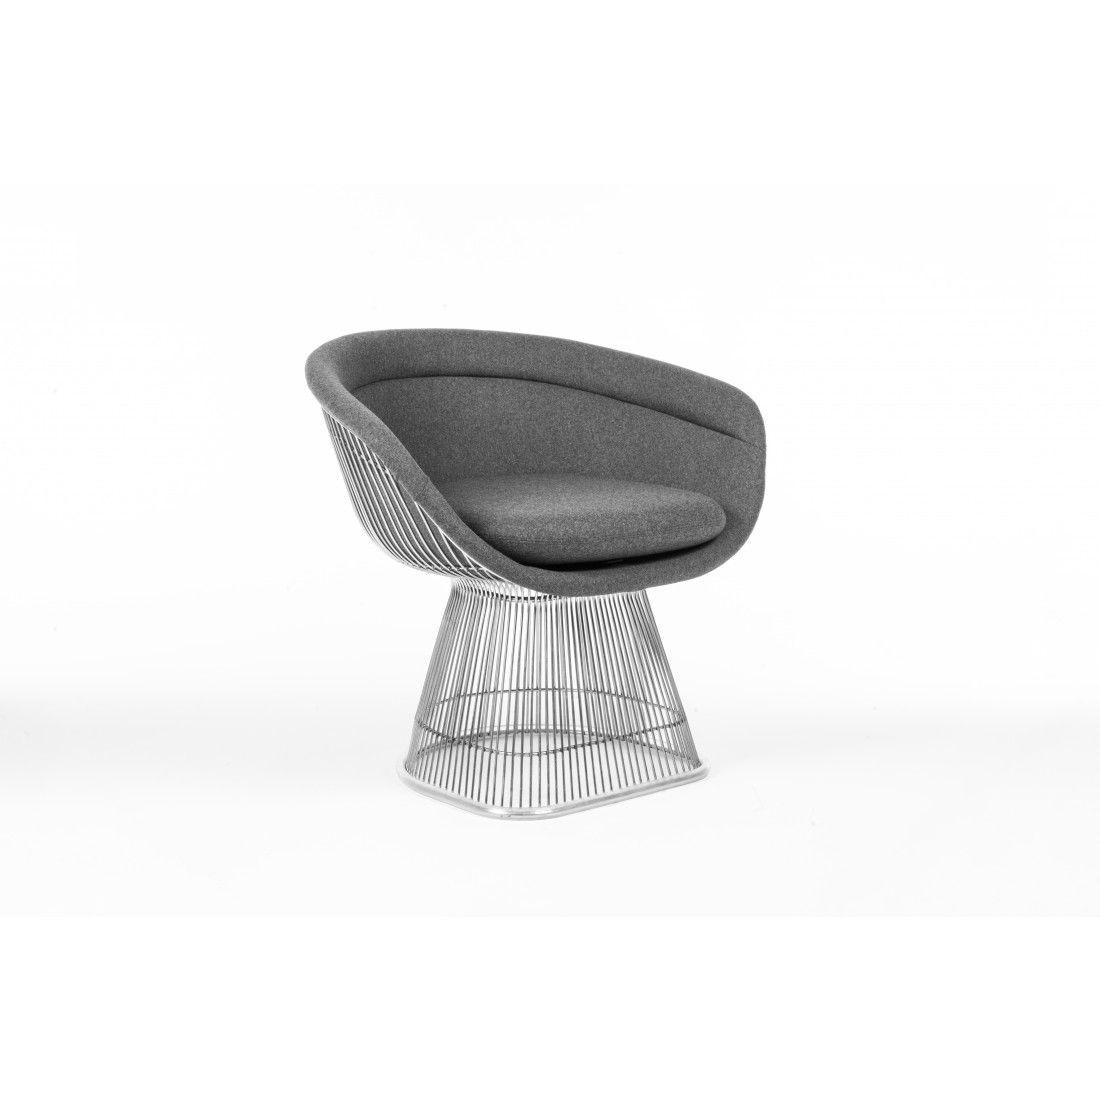 Lounge Chair - Dark Grey 1 http://www.franceandson.com/lounge-chair-dark-grey.html